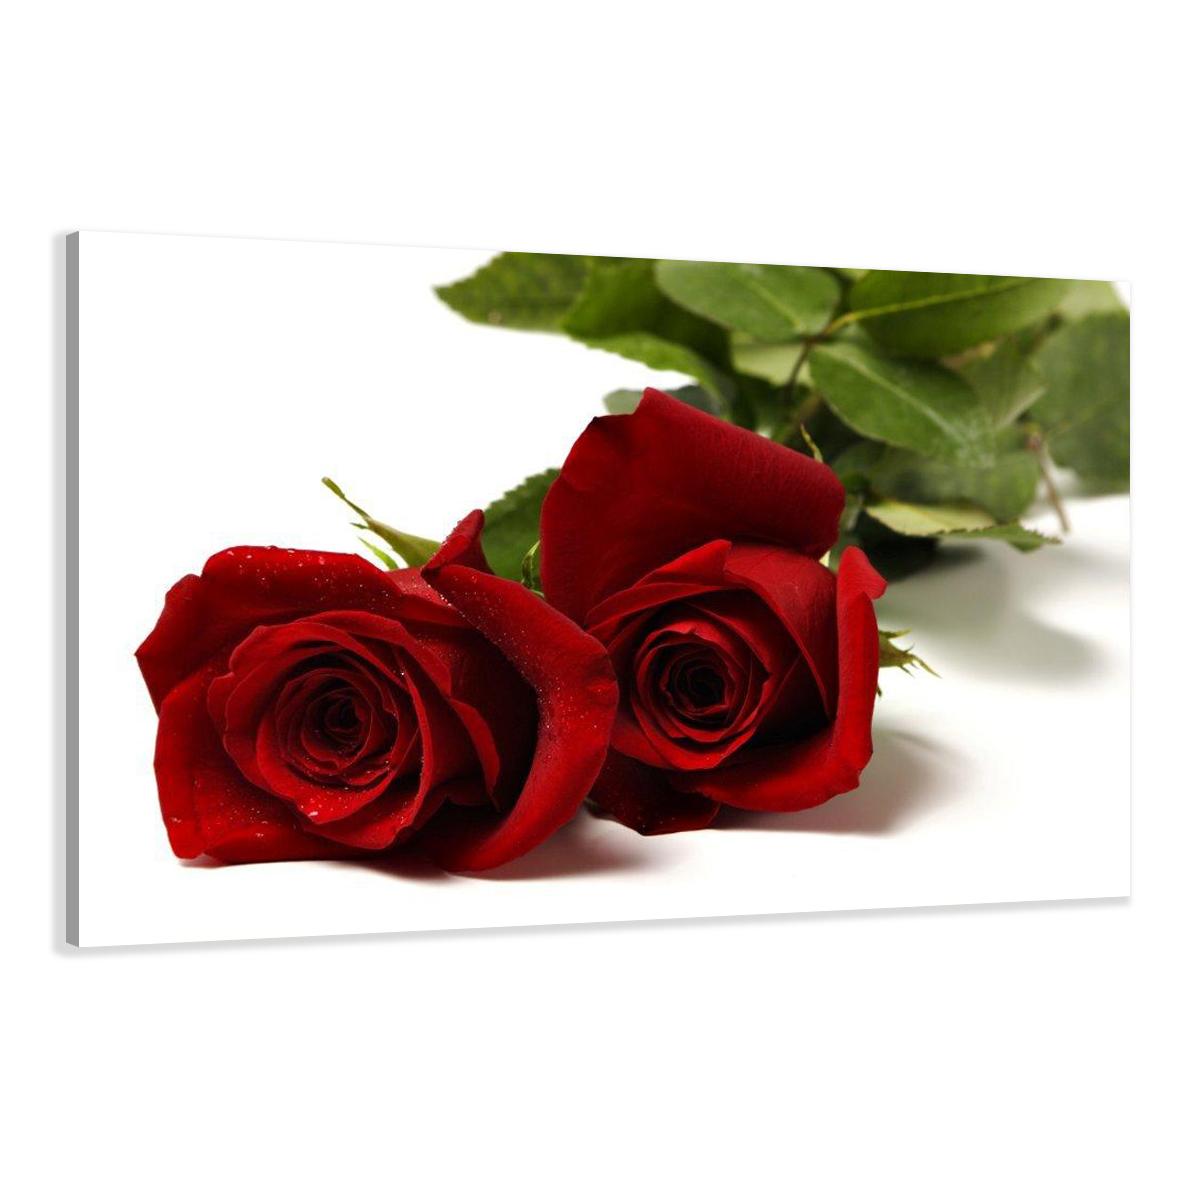 Leinwand wandbilder verschiedene bilder motive 120 x 80 cm - Significado rosas blancas ...